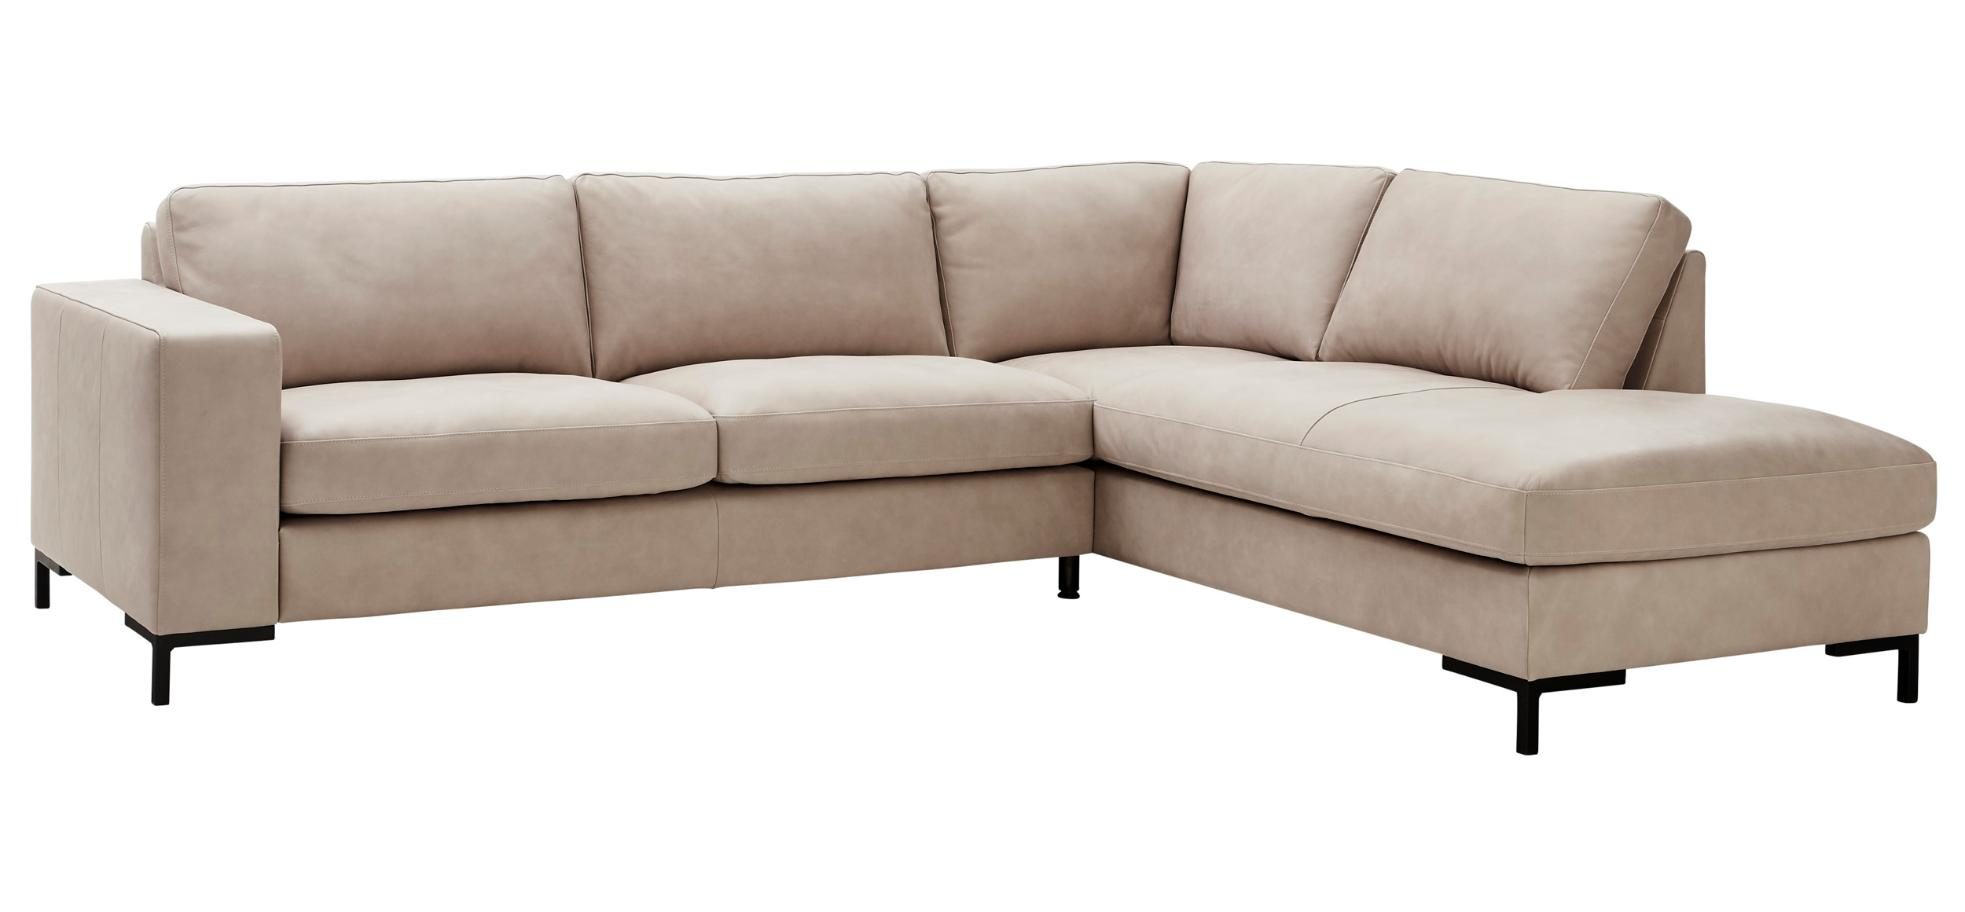 Full Size of Natura Sofa Denver Home Newport Livingston Couch Kansas Brooklyn Love Gebraucht Kaufen Polsterecke In Hellem Leder Kitzmann Company Breit 3er Grau Lounge Sofa Natura Sofa